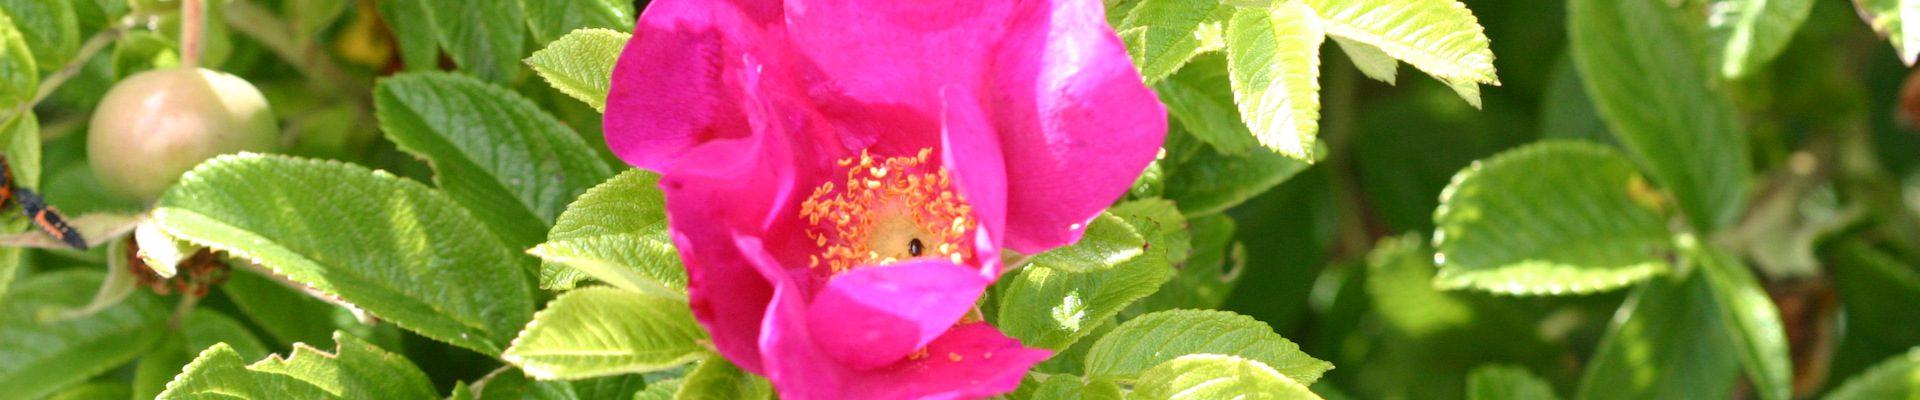 Hagebutte in meinem Heilkräuter-Garten in Varel